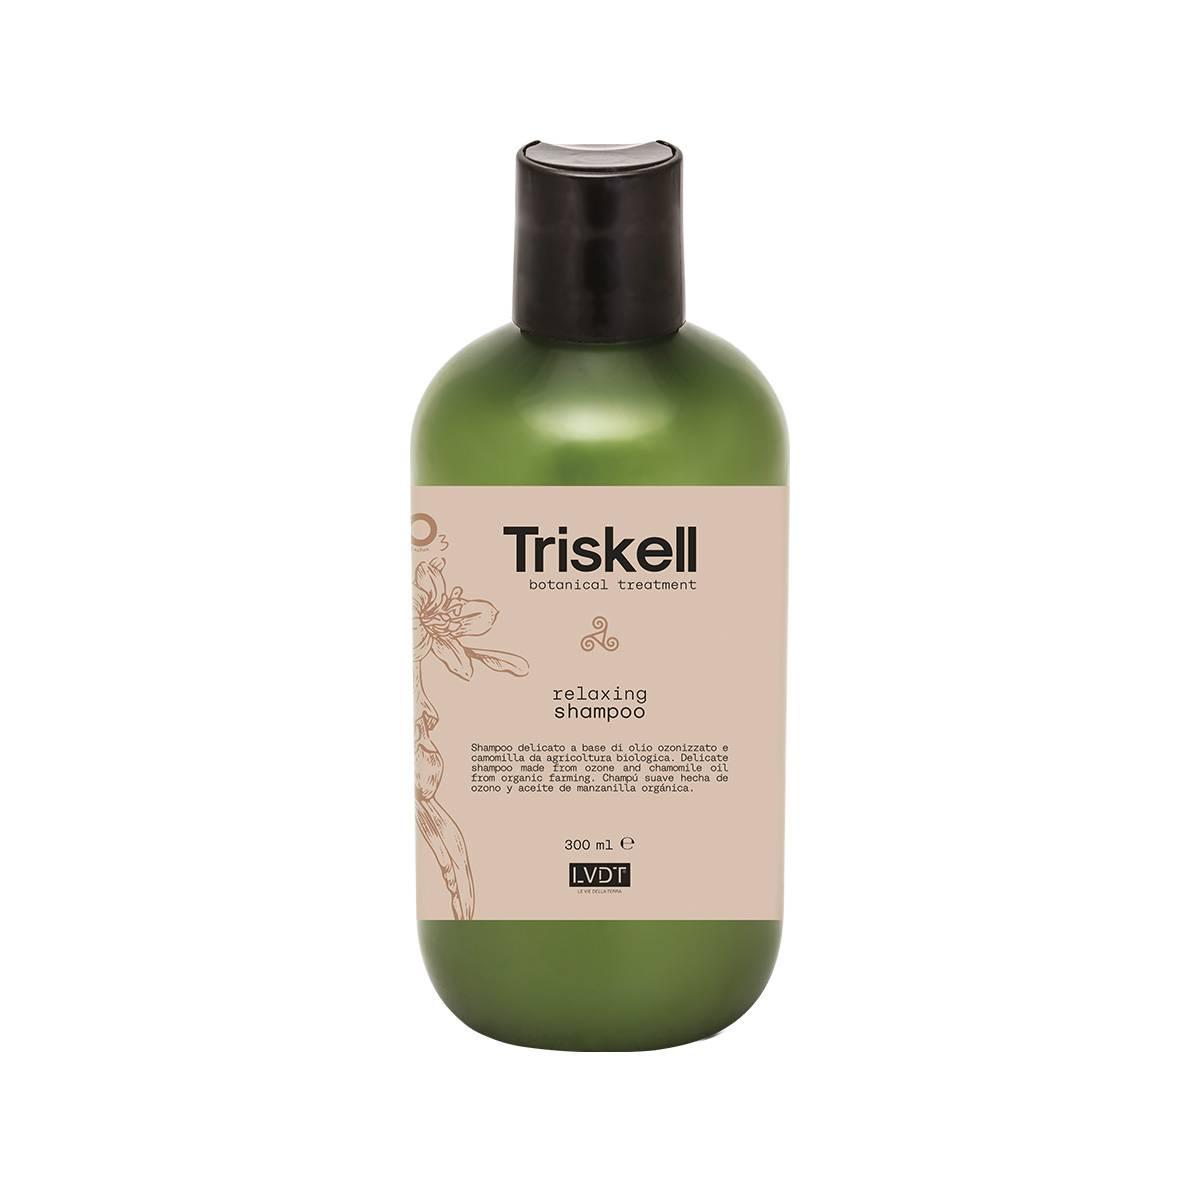 Relaxing shampoo 300 ml new triskell nuova botanical treatment CALMANTE/RILASSANTE